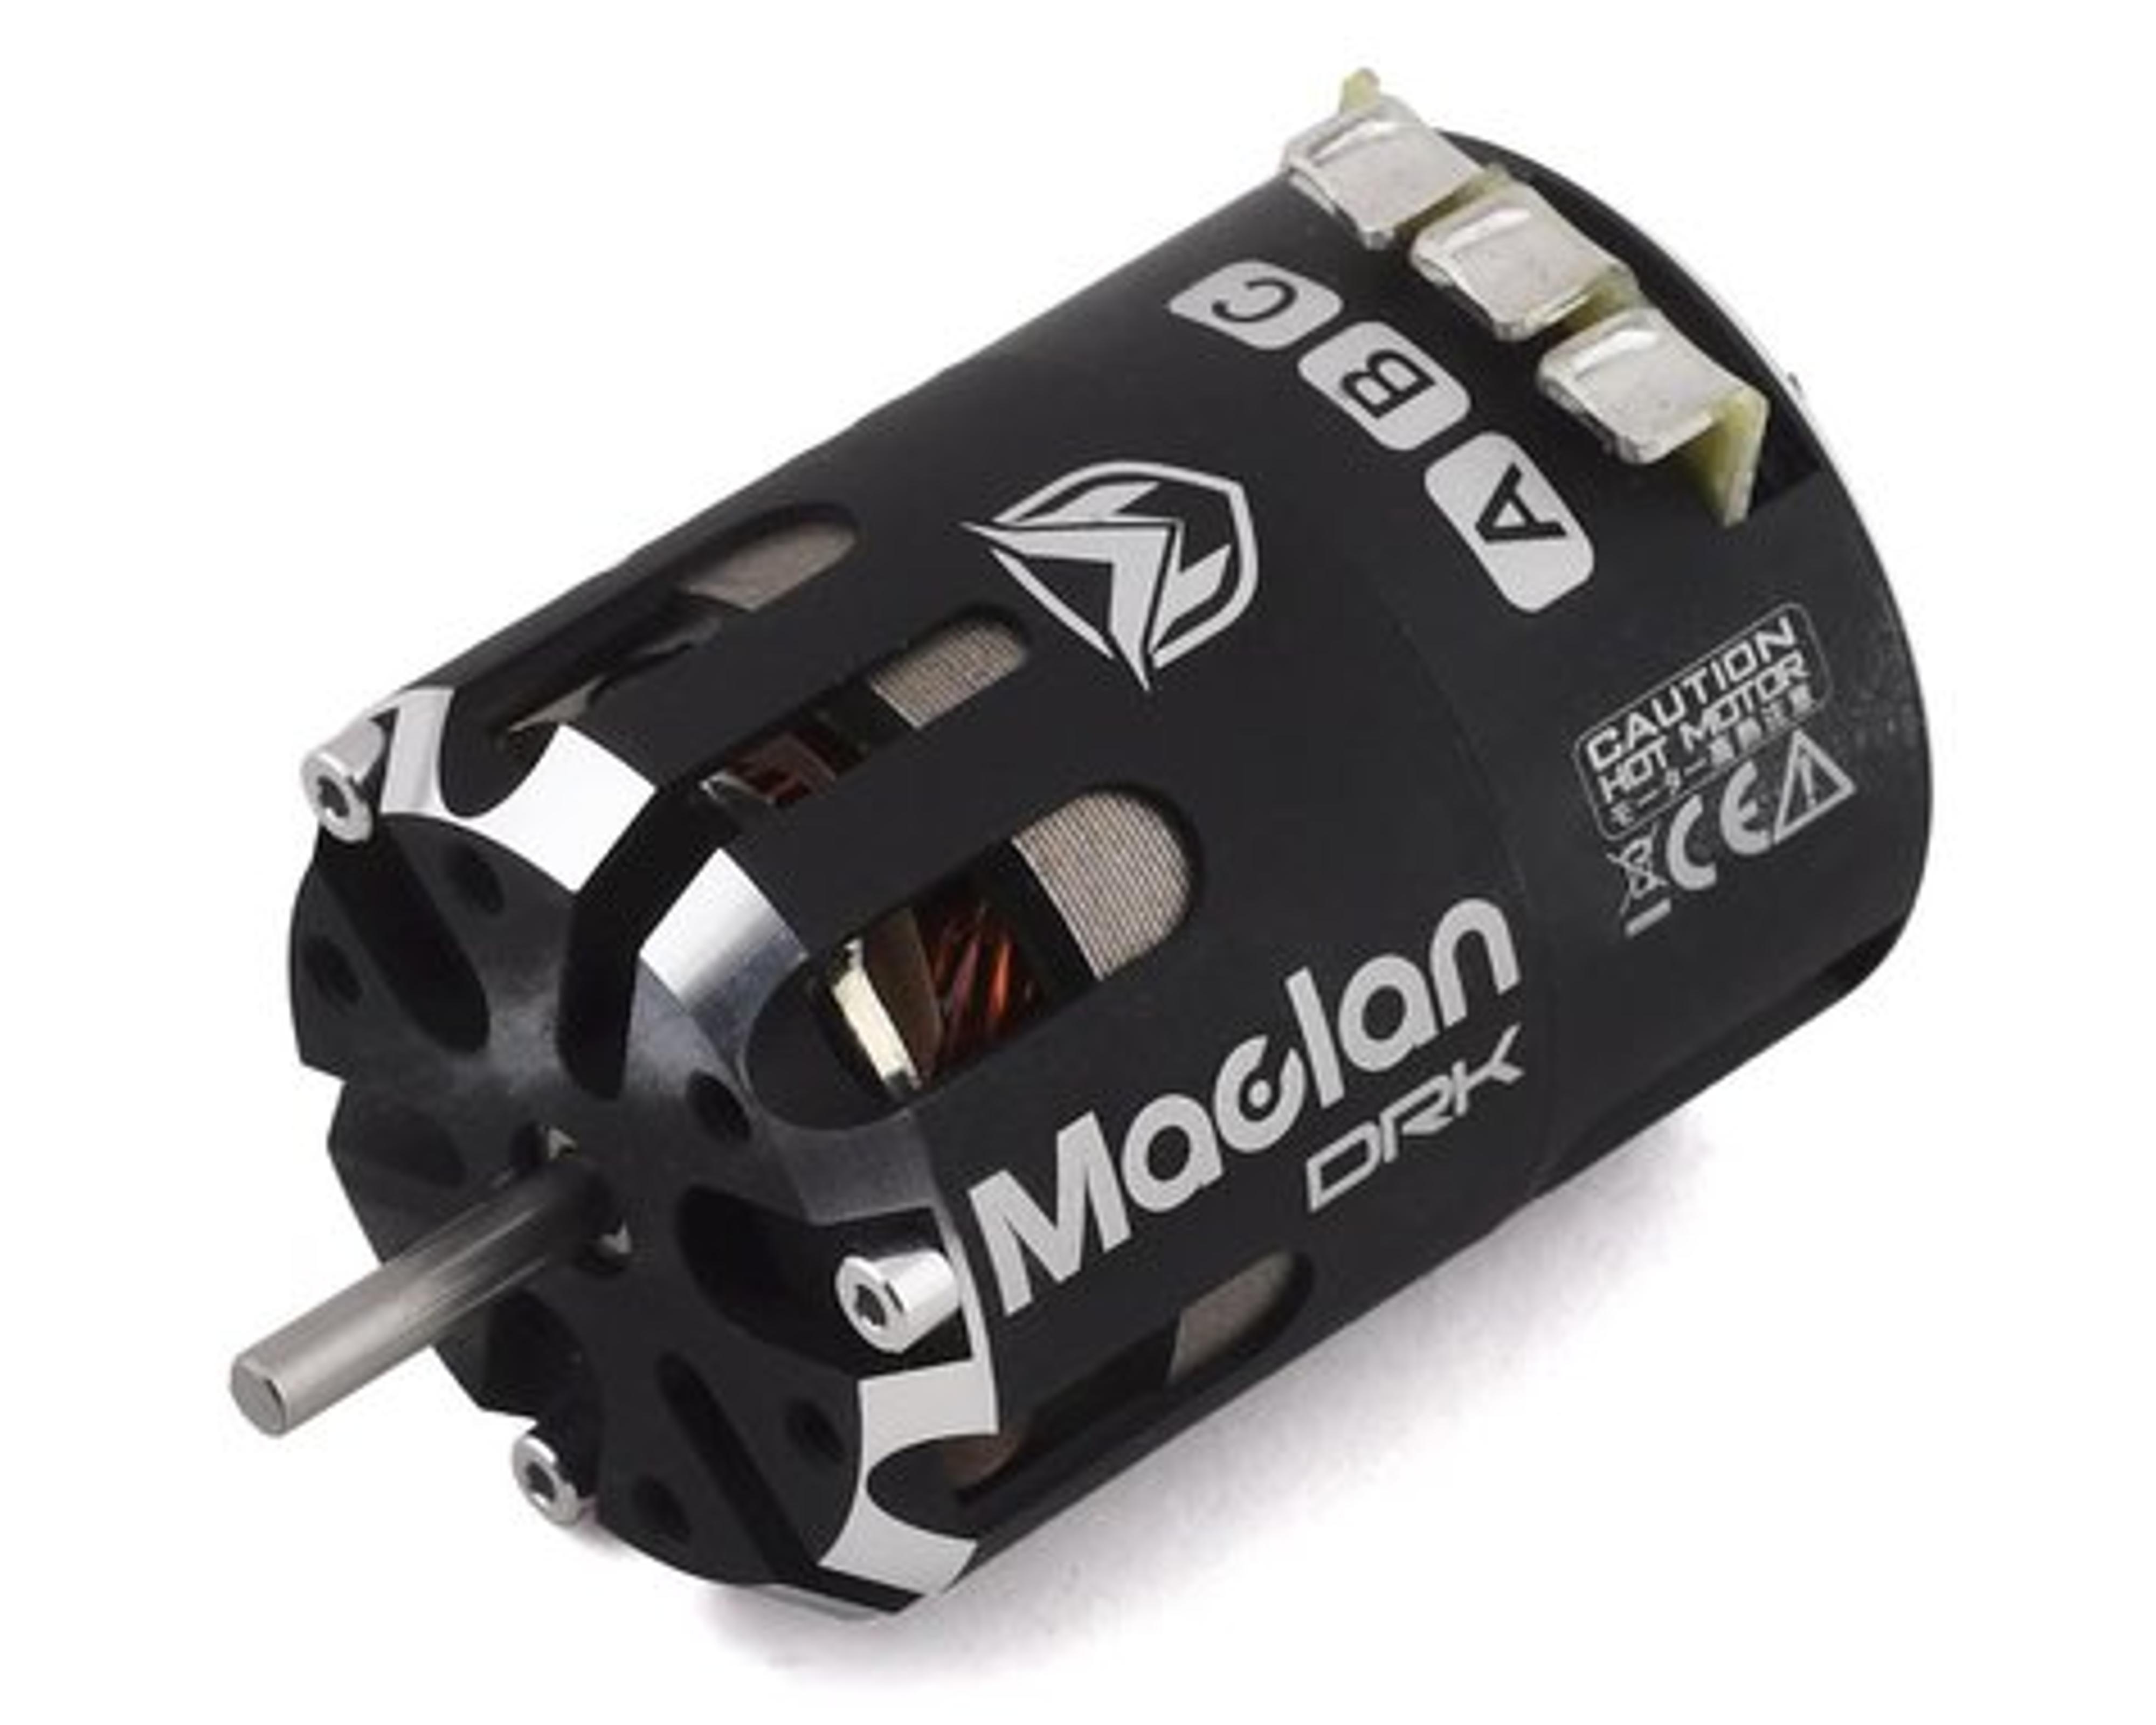 Maclan DRK 6X Super Capacitor Pack Drag Racing MCL4236